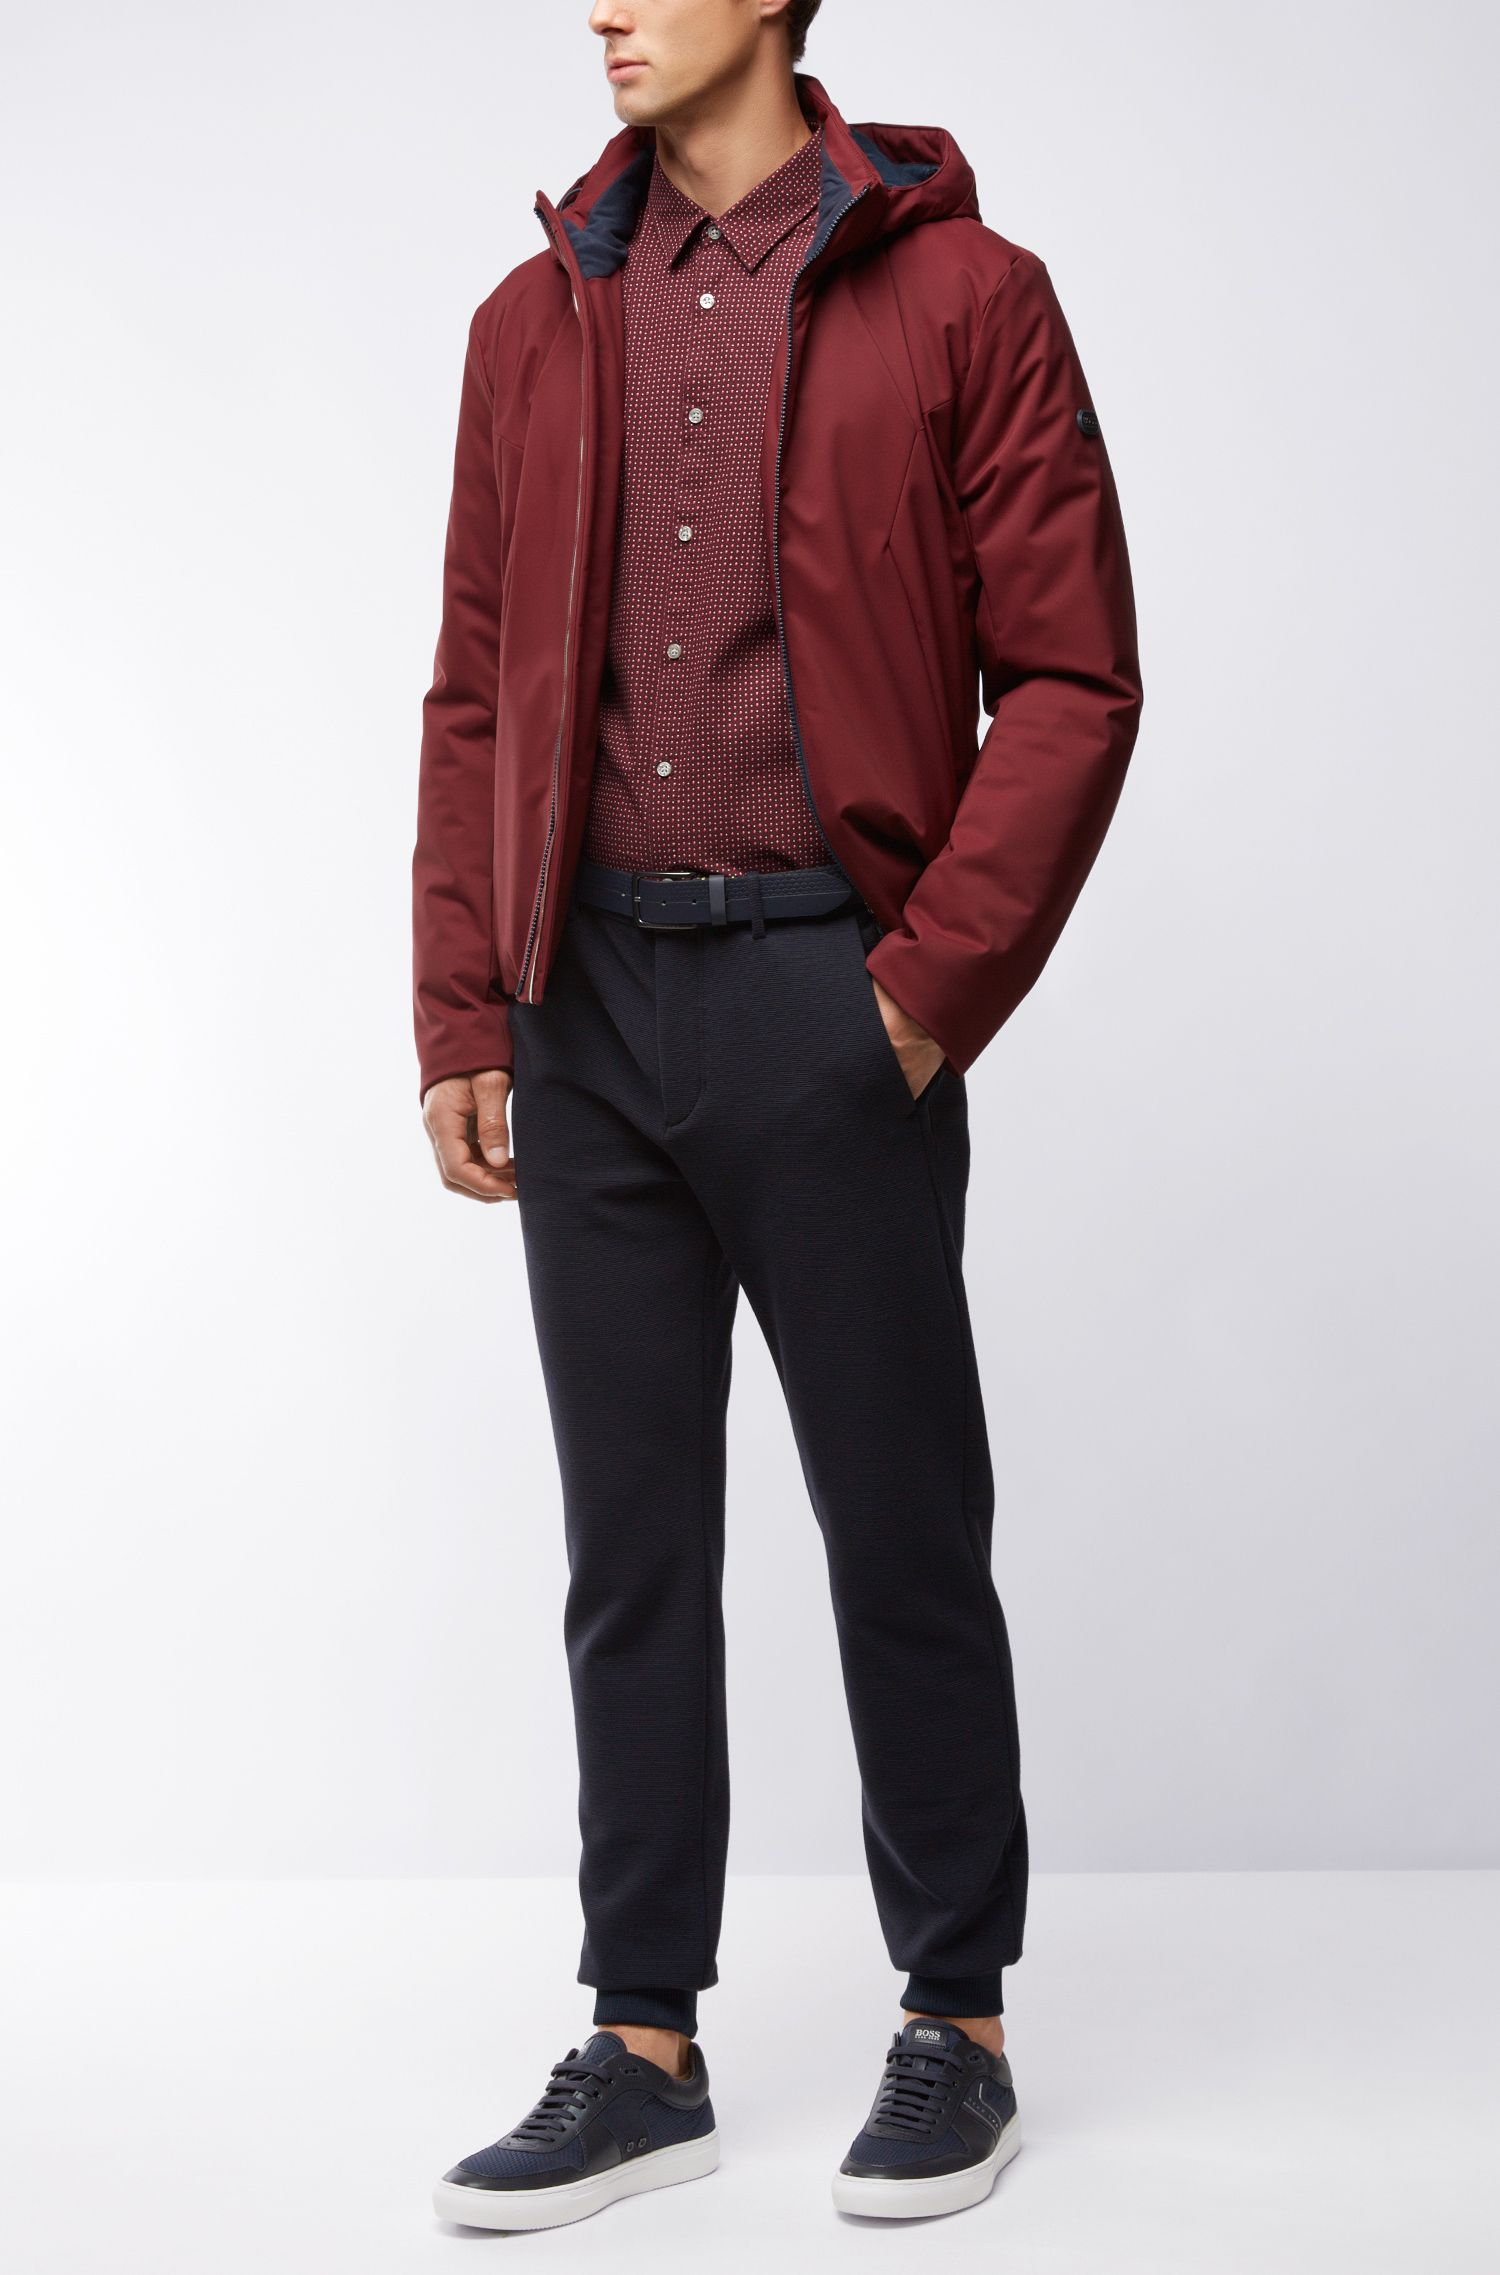 Cotton Button Down Shirt, Regular Fit | C-Bustai R, Red